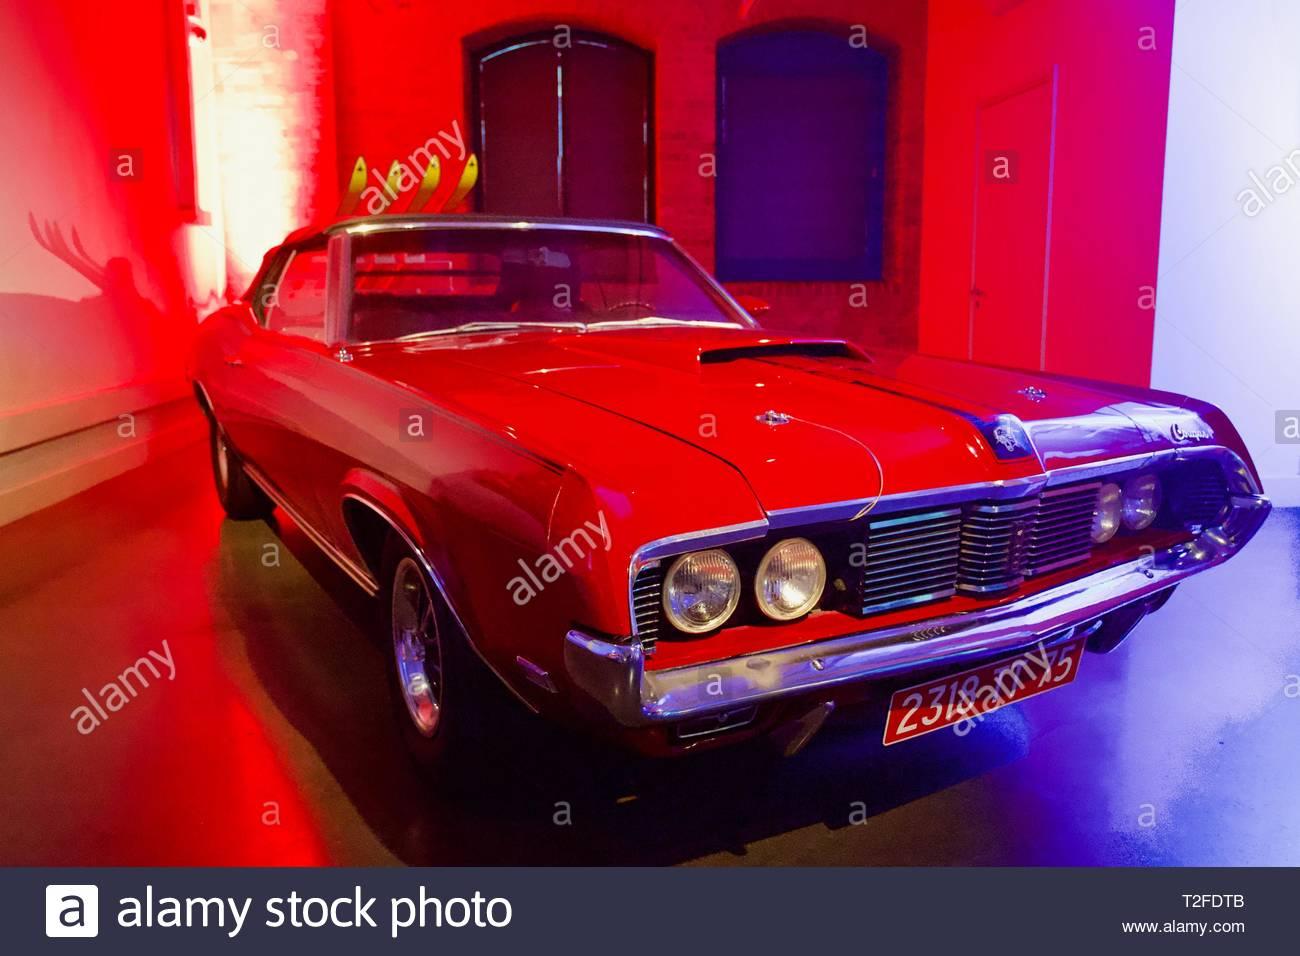 Bond in Motion. London Film Museum. On Her Majesty's Secret Service 1969 - Mercury Cougar XR-7 1969. London, England. - Stock Image